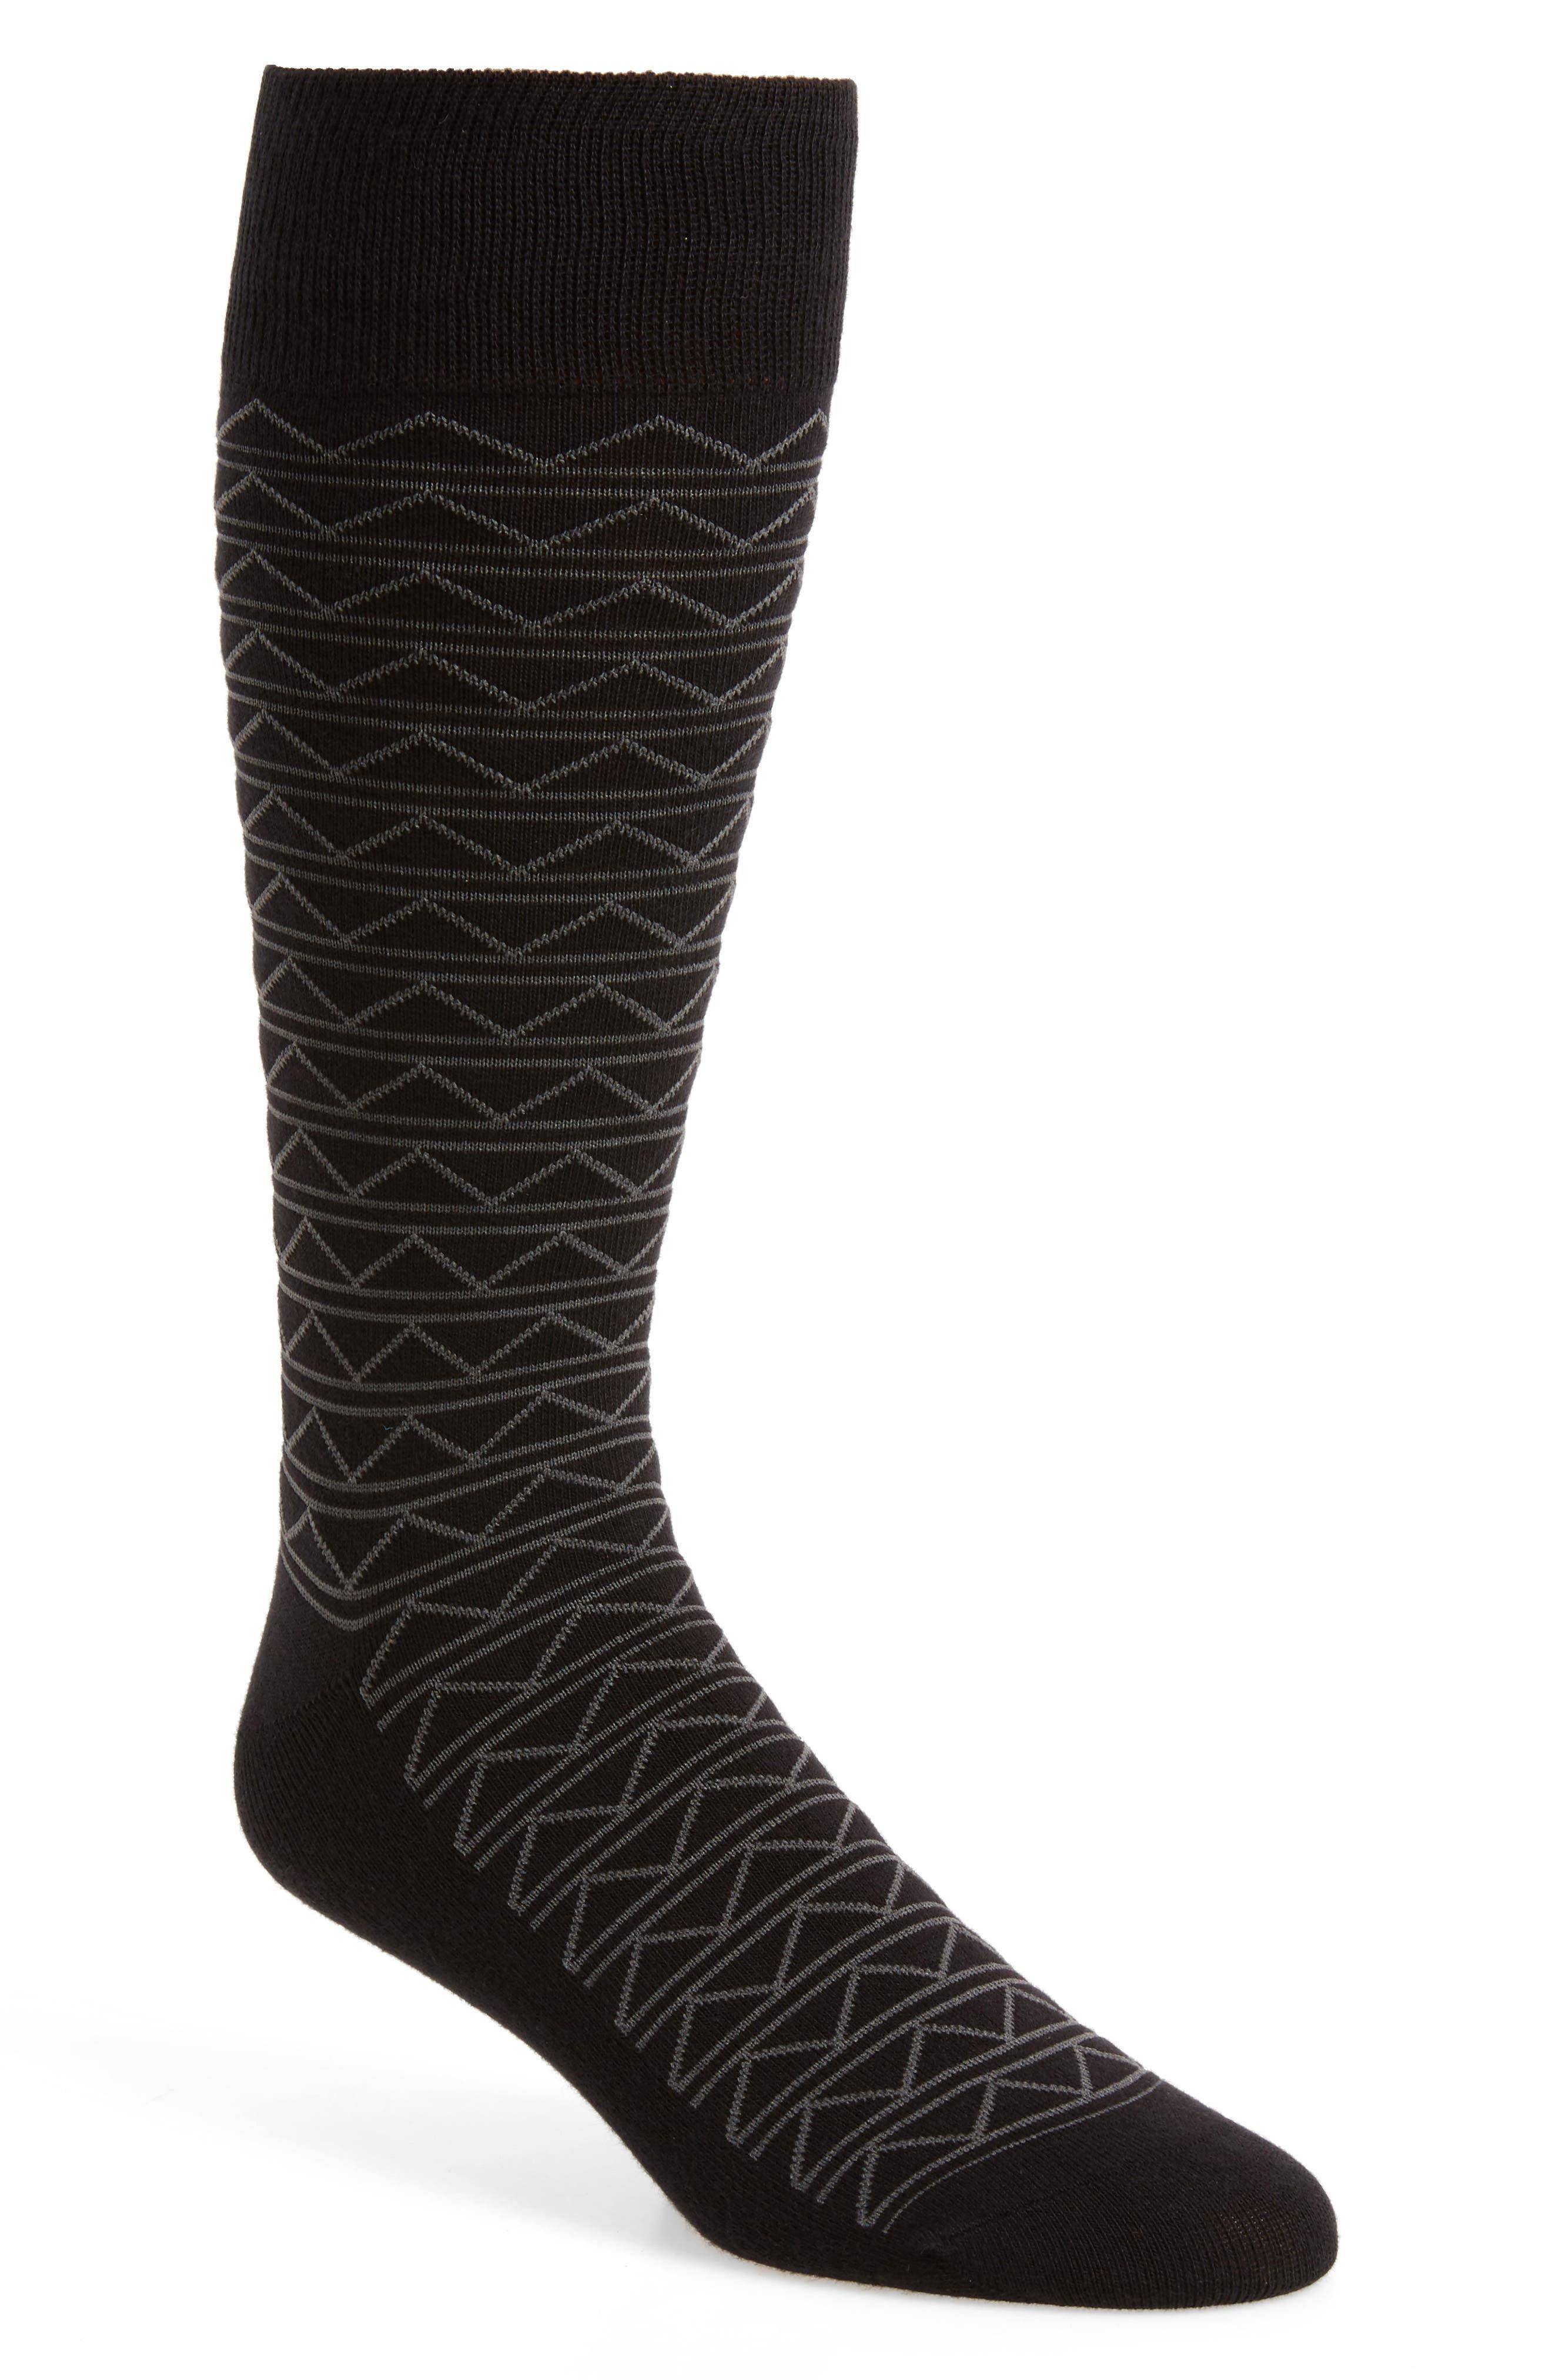 Zigzag Socks,                         Main,                         color,